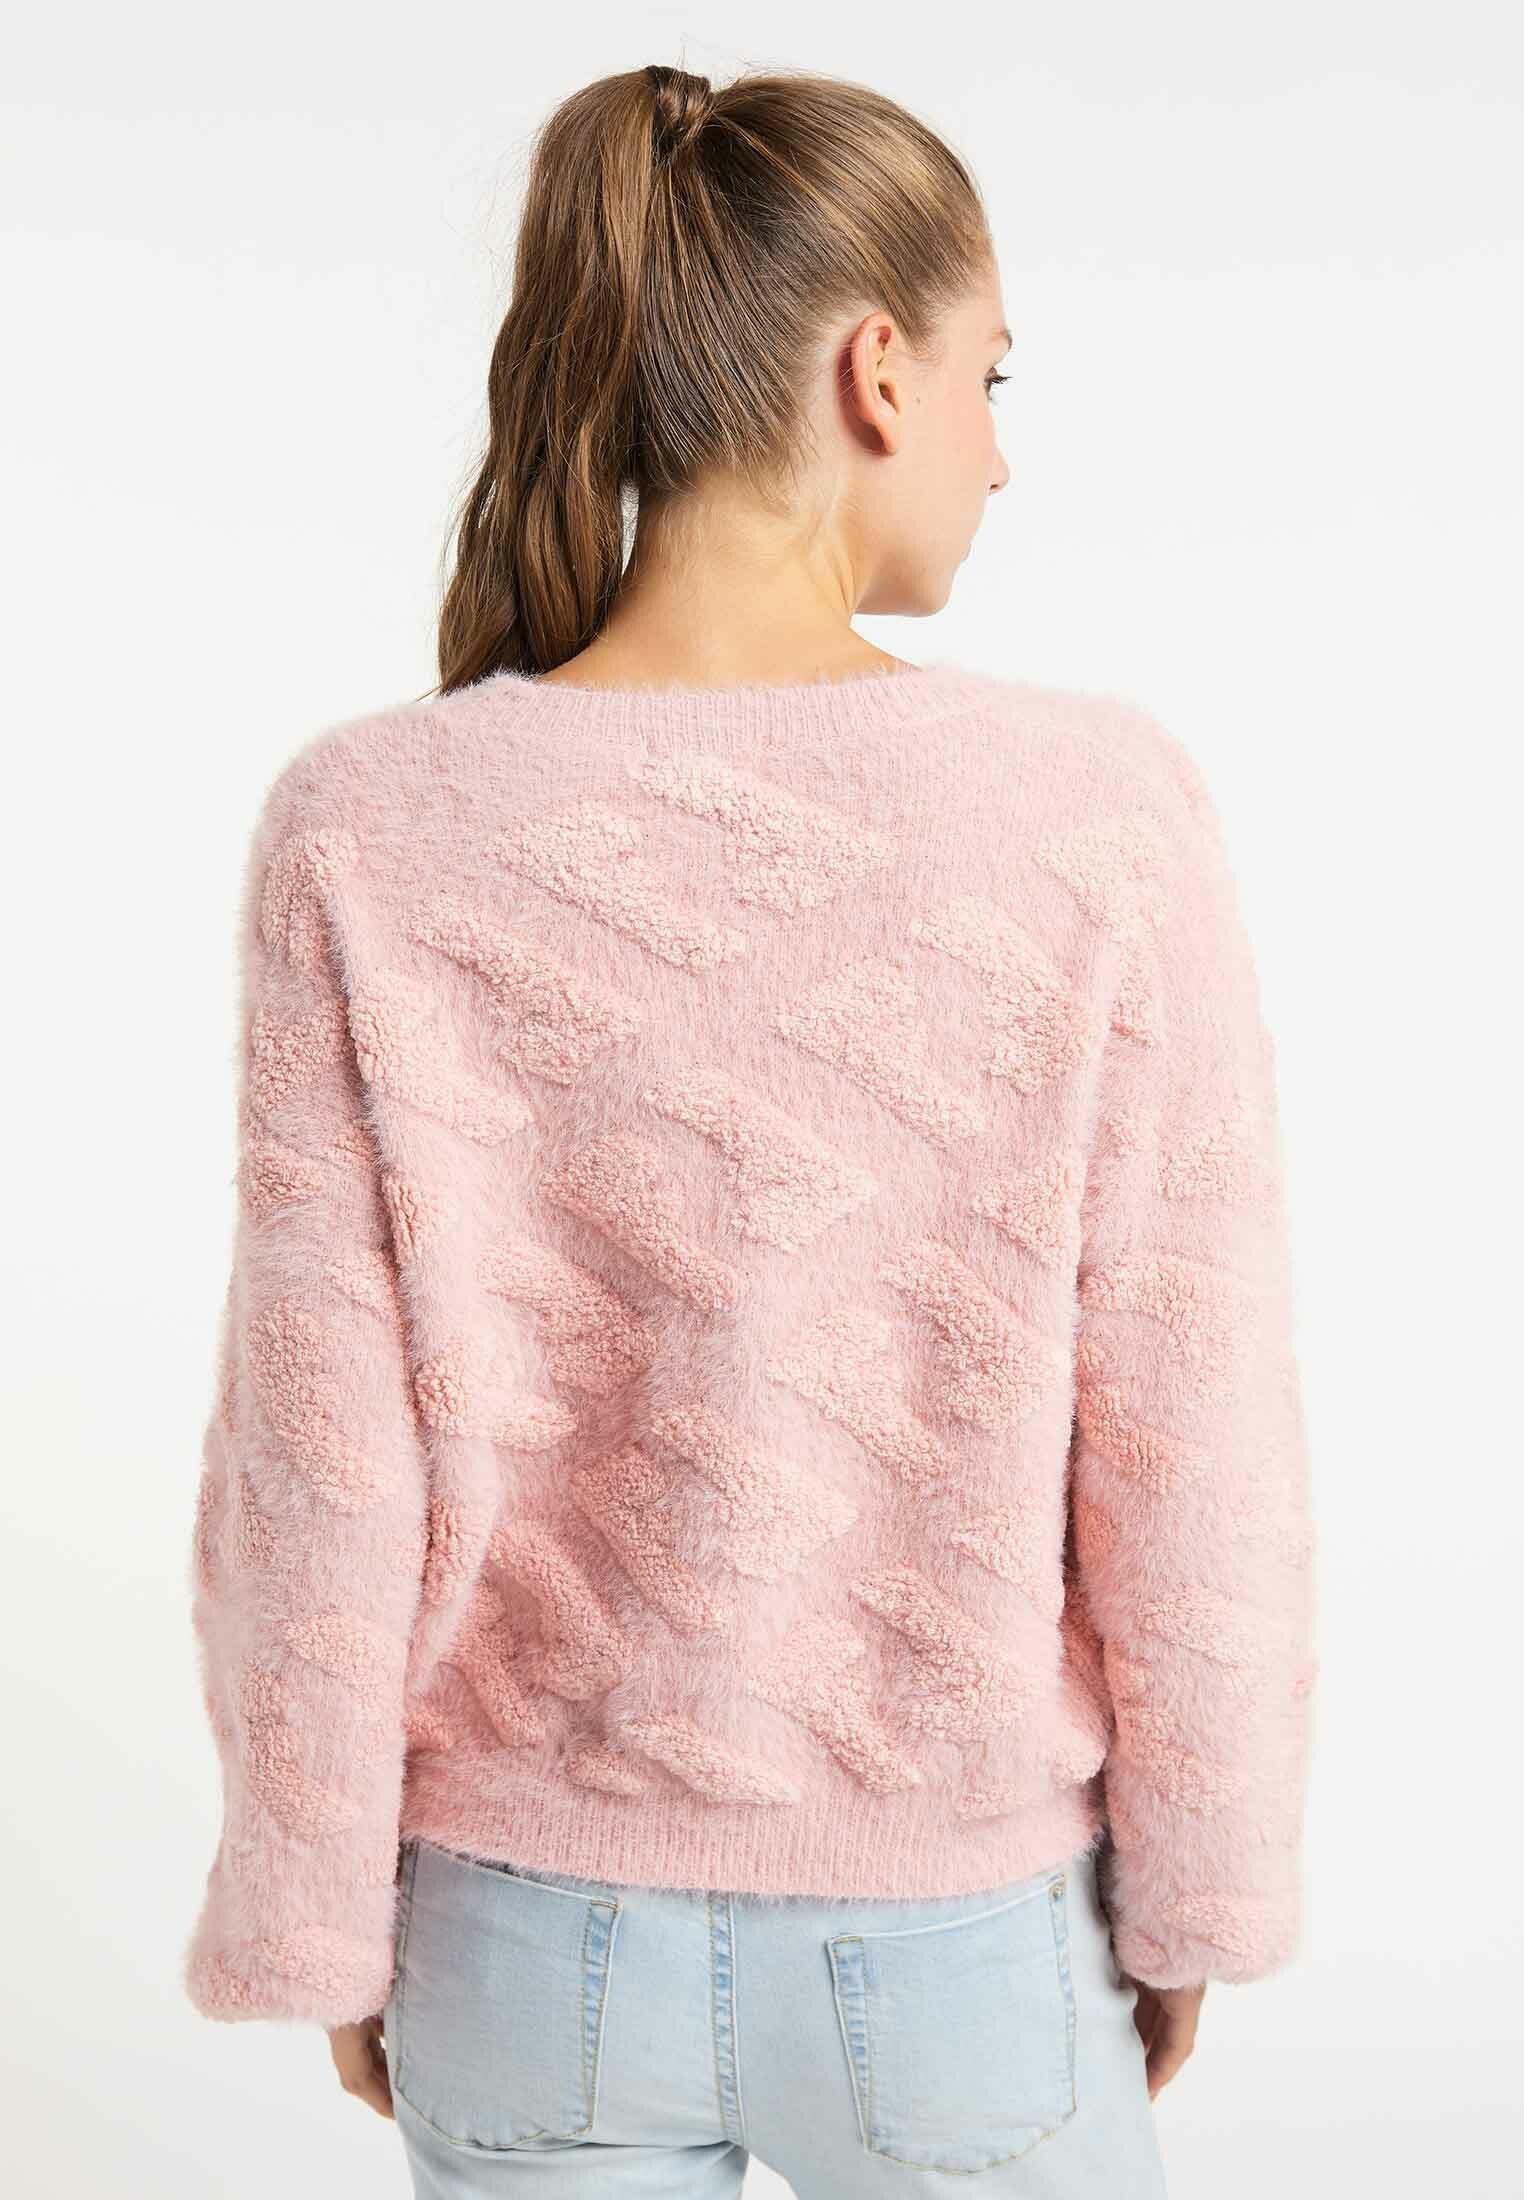 Mymo Mymo Pink Pink Maglione Maglione Mymo Maglione Maglione Pink Pink Mymo Mymo hQsdtr